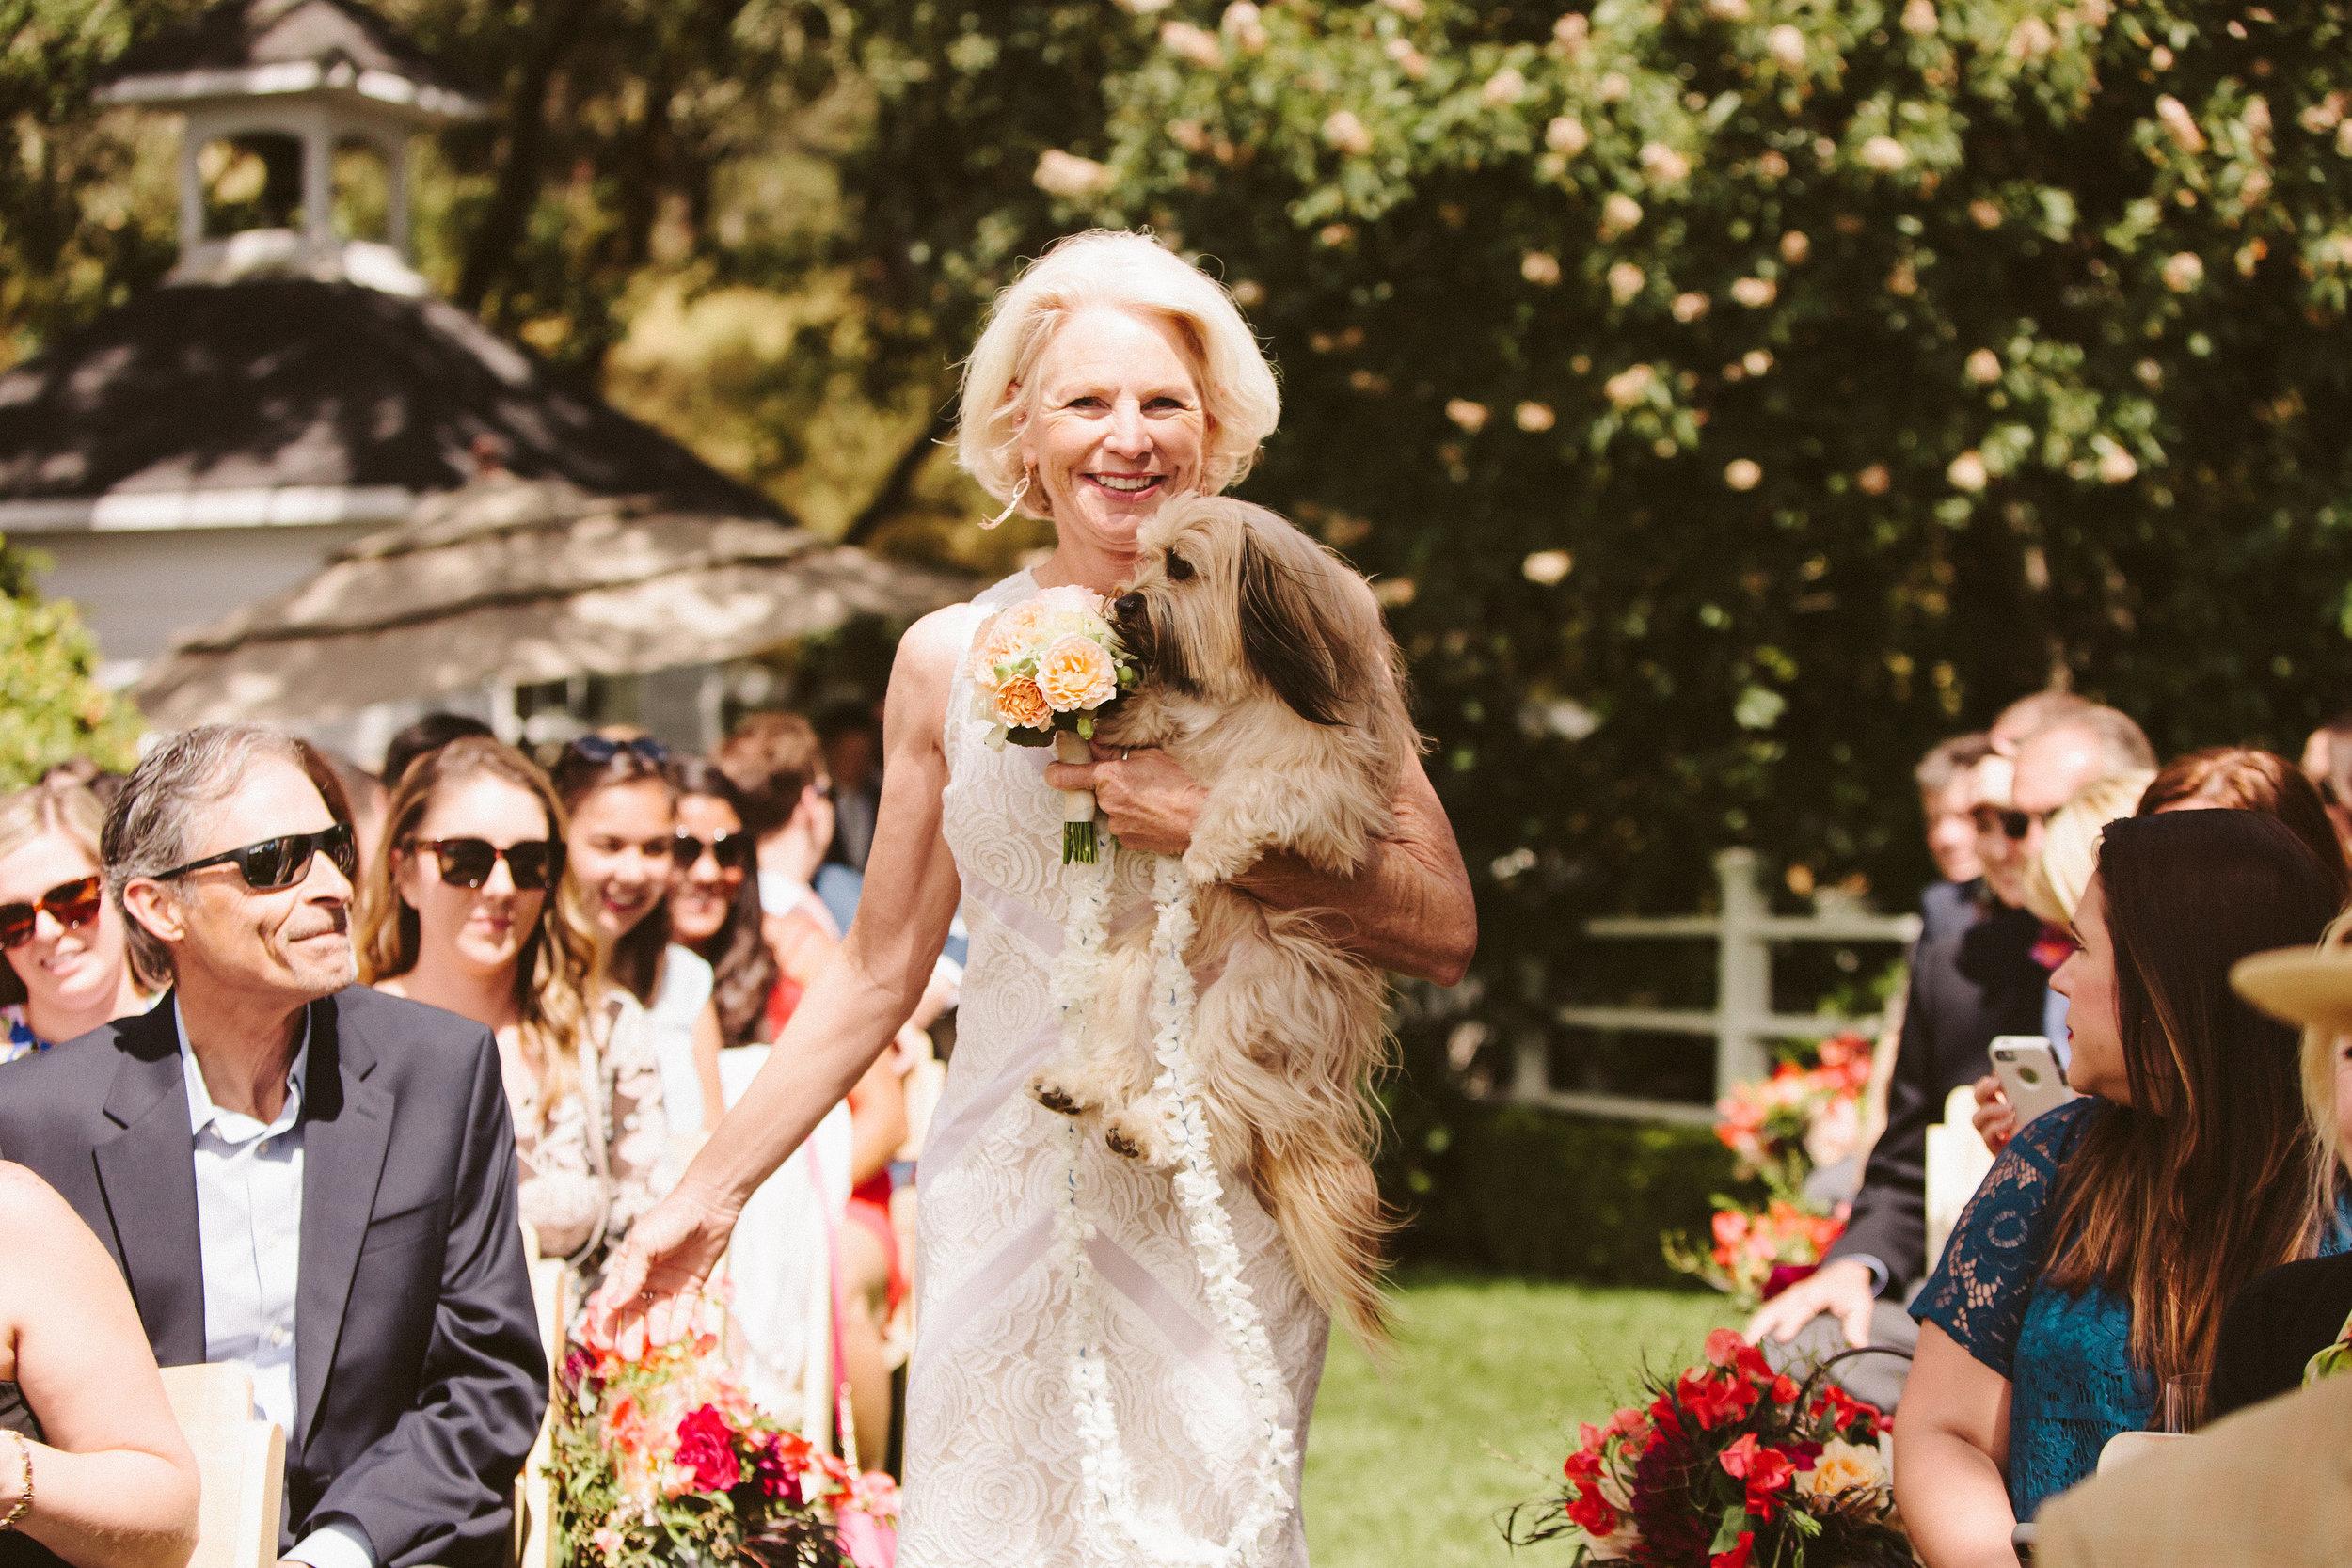 Running-Rabbit-Ranch-wedding-206.JPG